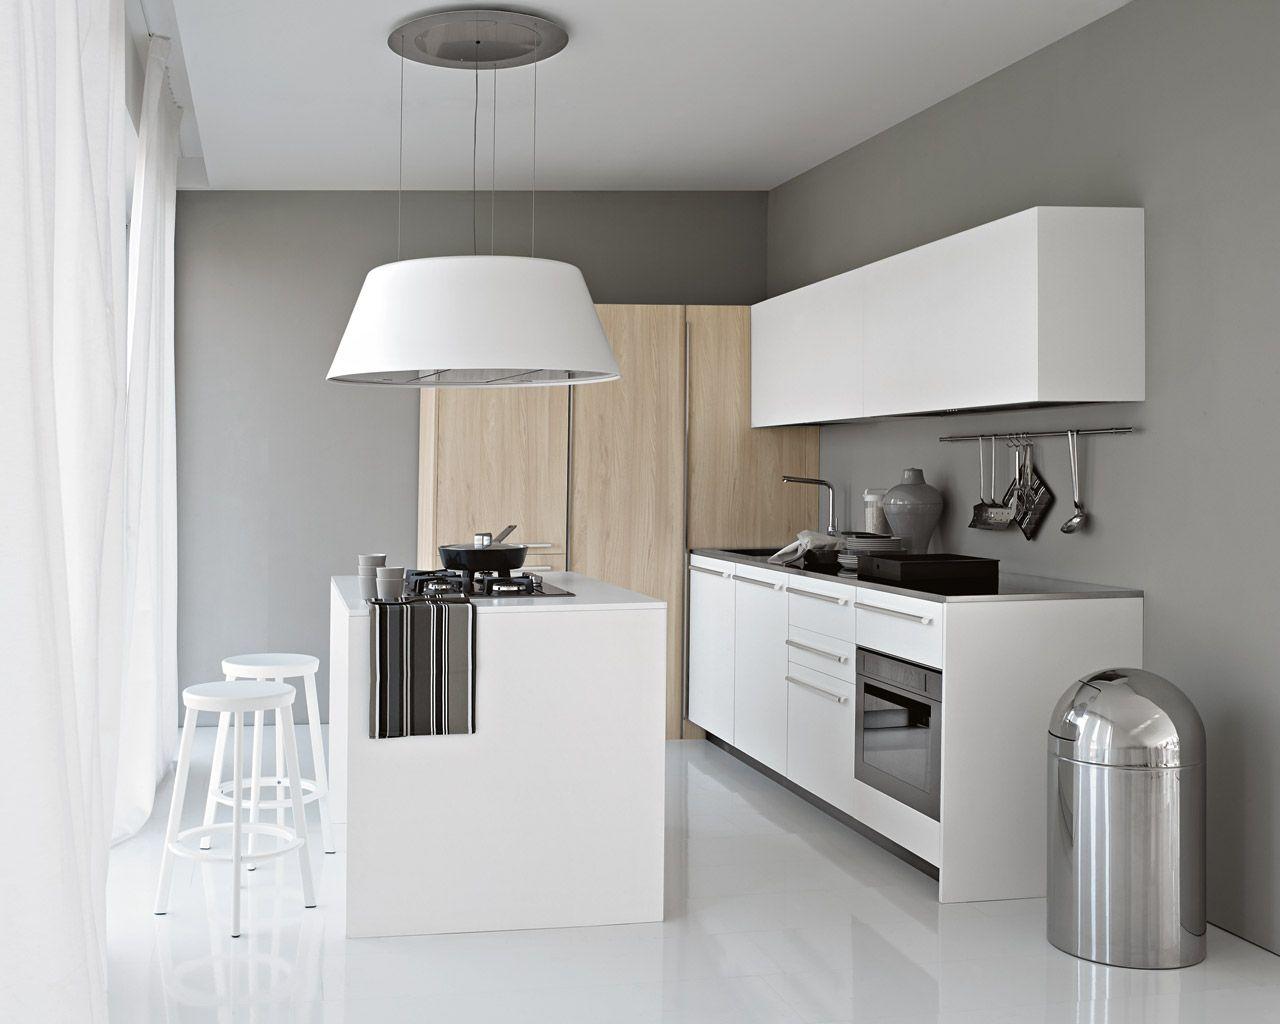 Ispirazioni | Elmar Cucine | Cucine | Pinterest | Cucine, Cucine ...